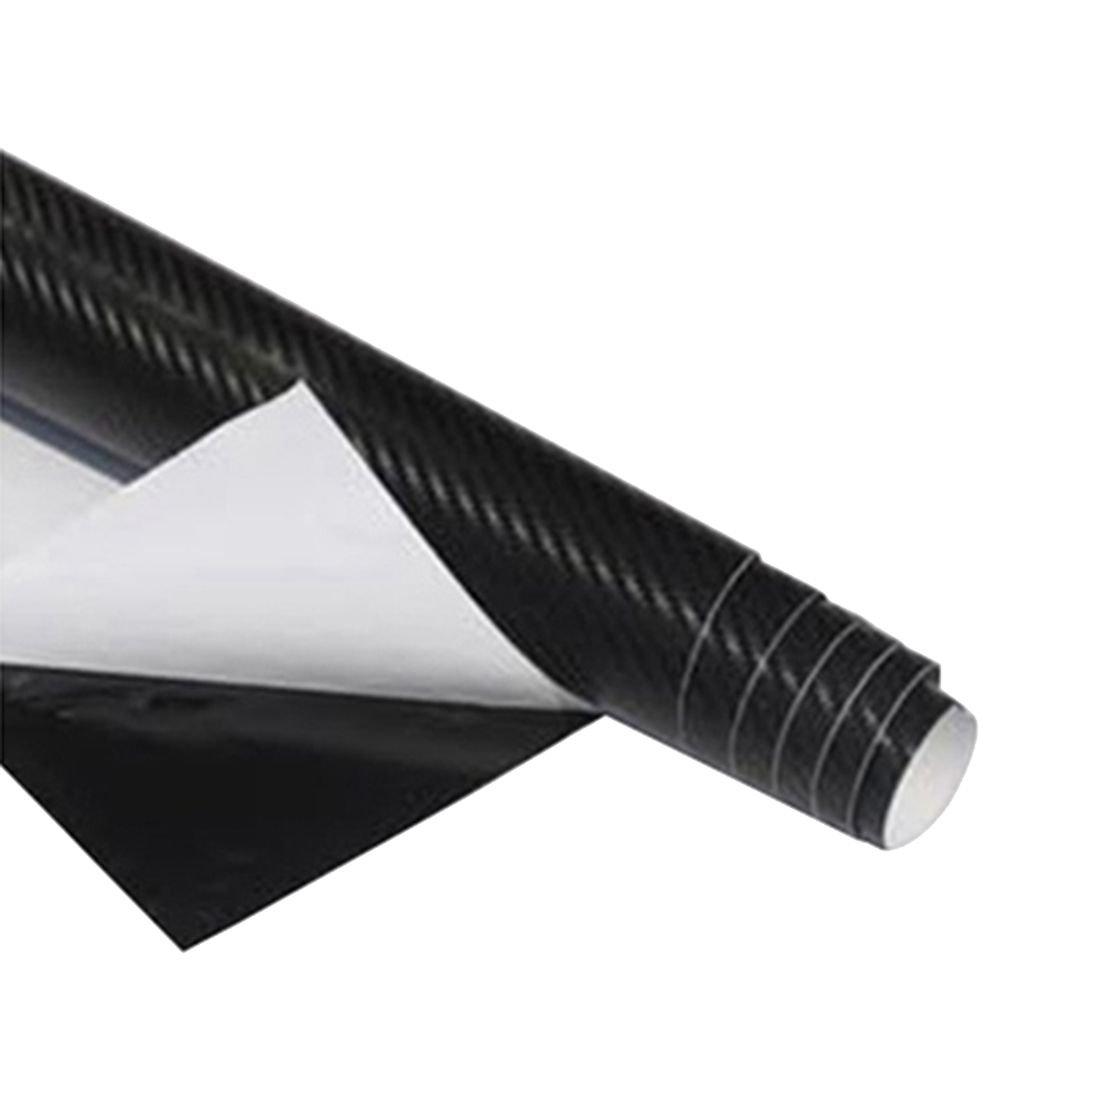 Car Vehicle DIY 3D Carbon Fiber Vinyl Wrap Roll Film Sticker Decal 70x10cm wine red R SODIAL